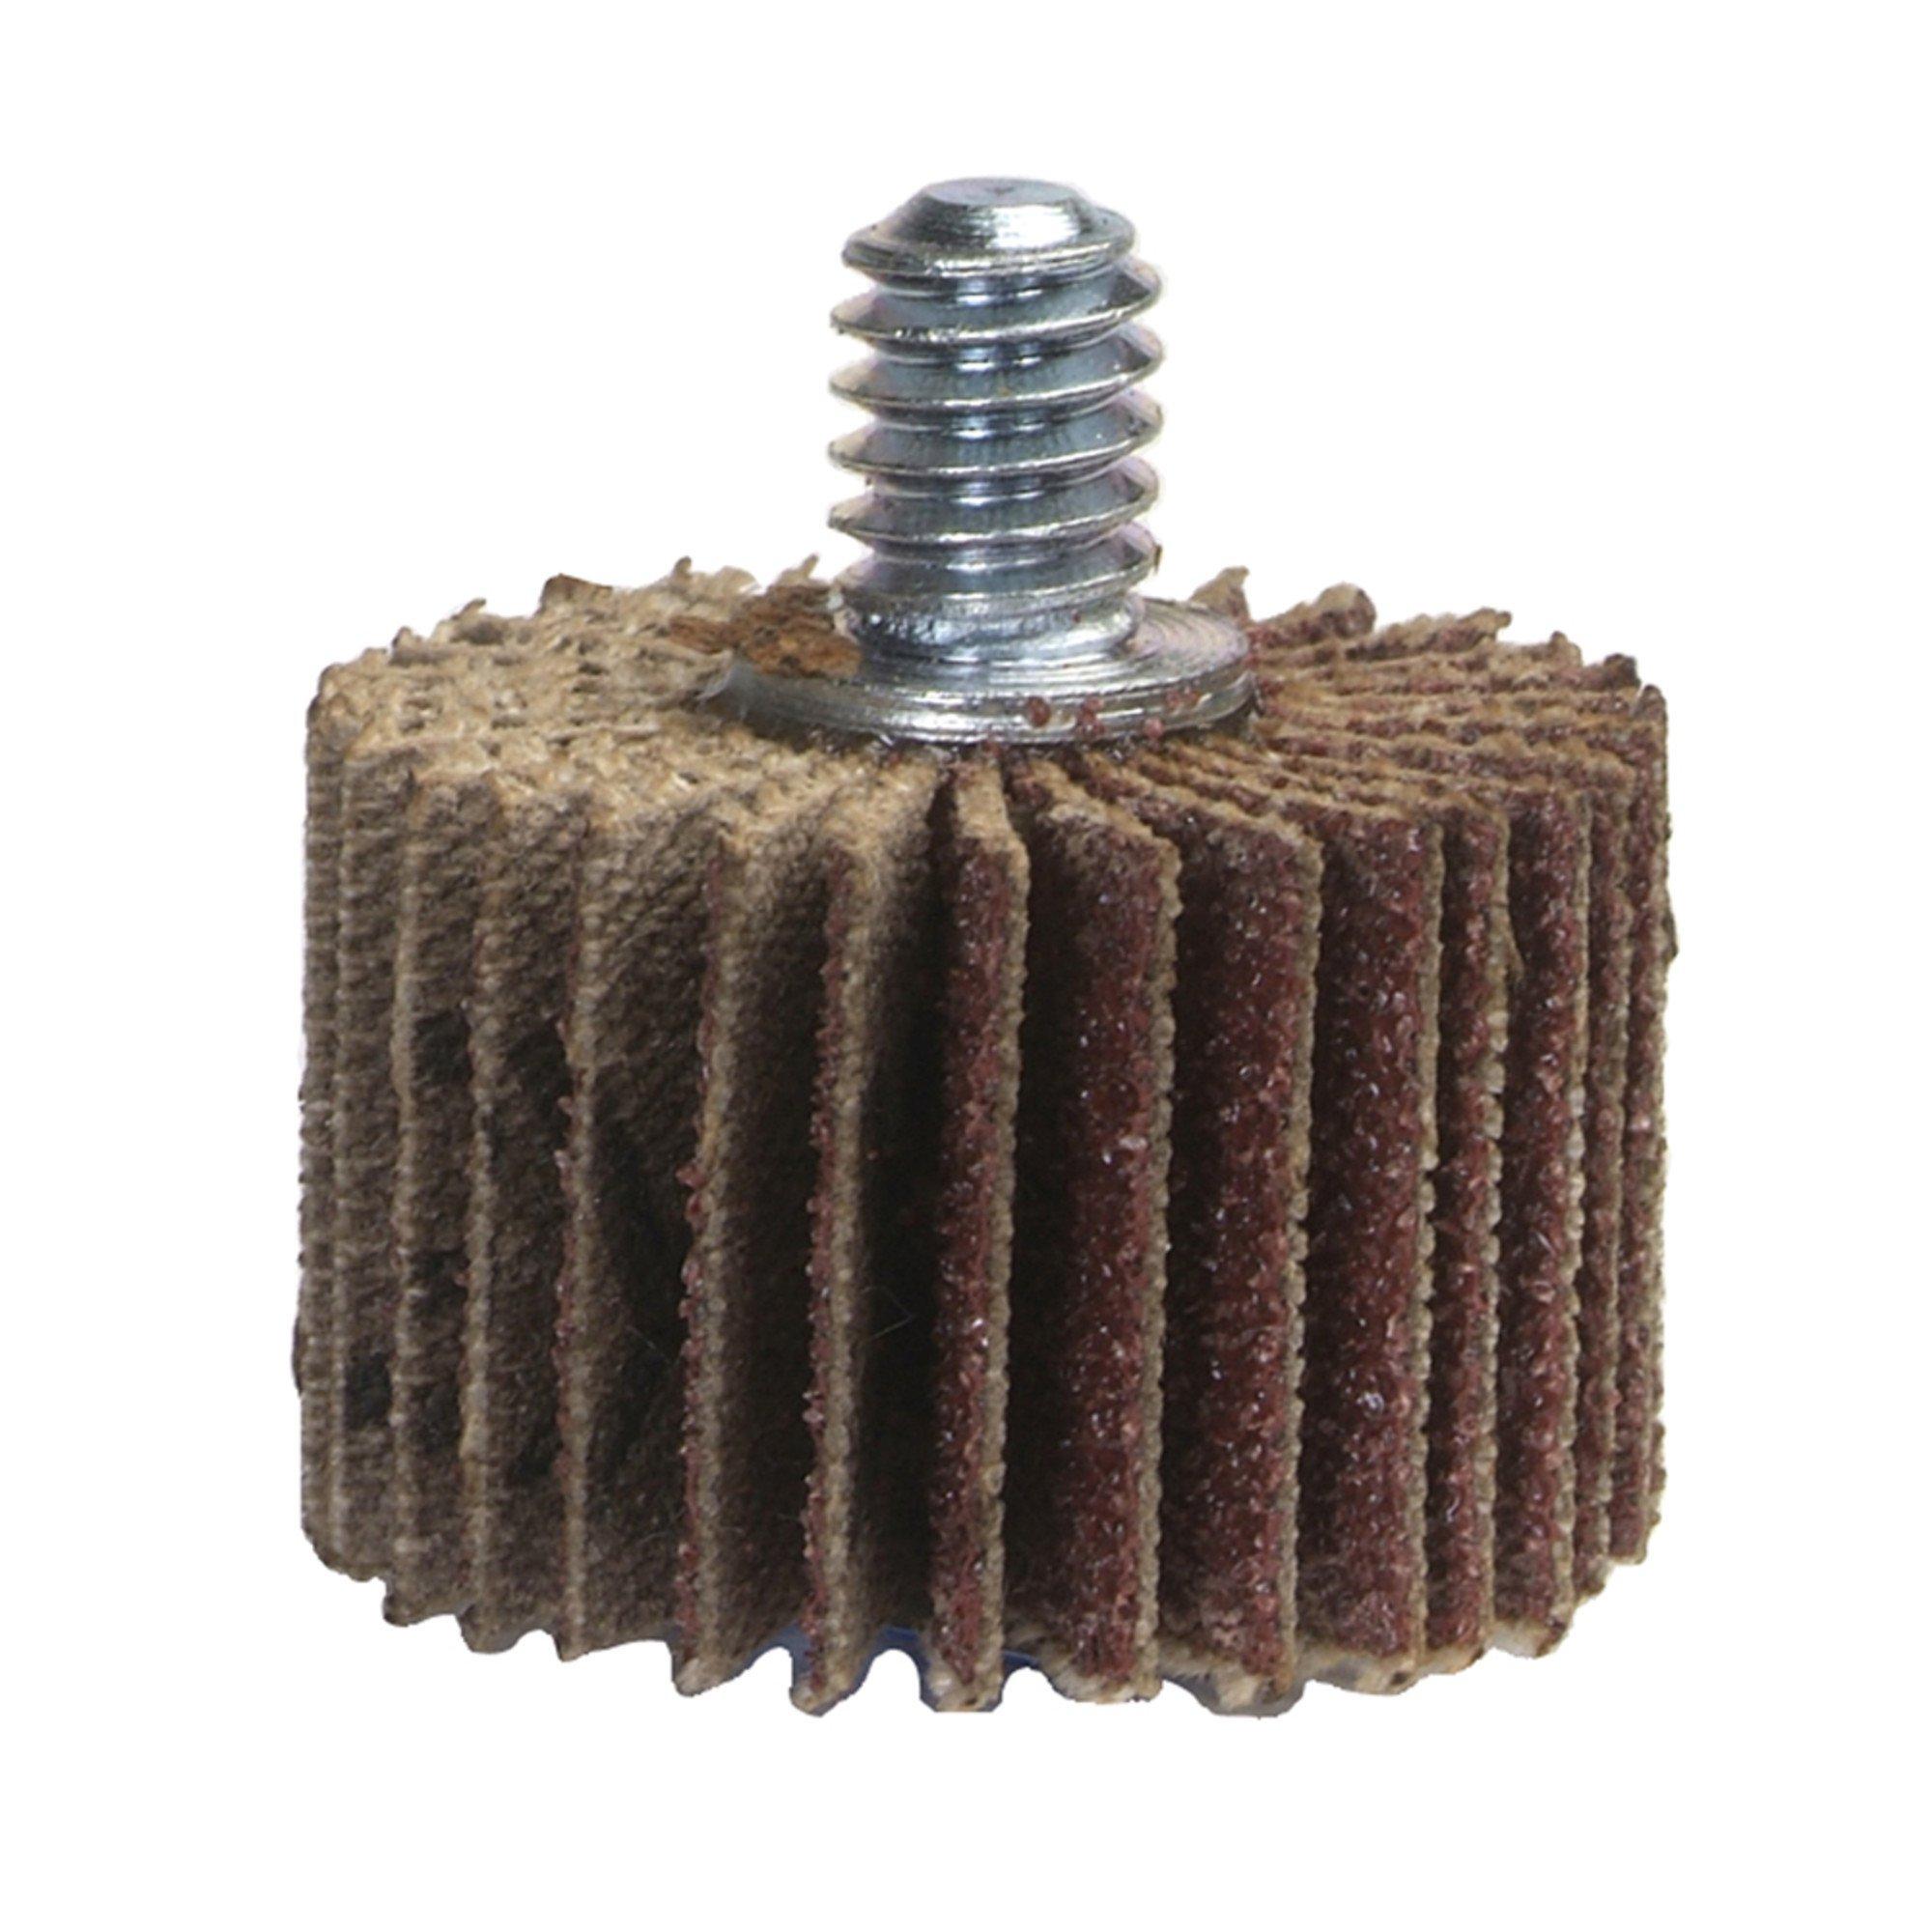 1 Box Of 10 Cgw abrasives 39932 Flap Wheels 2 X 1 X 1//4 Aluminum Oxide 60 Grit